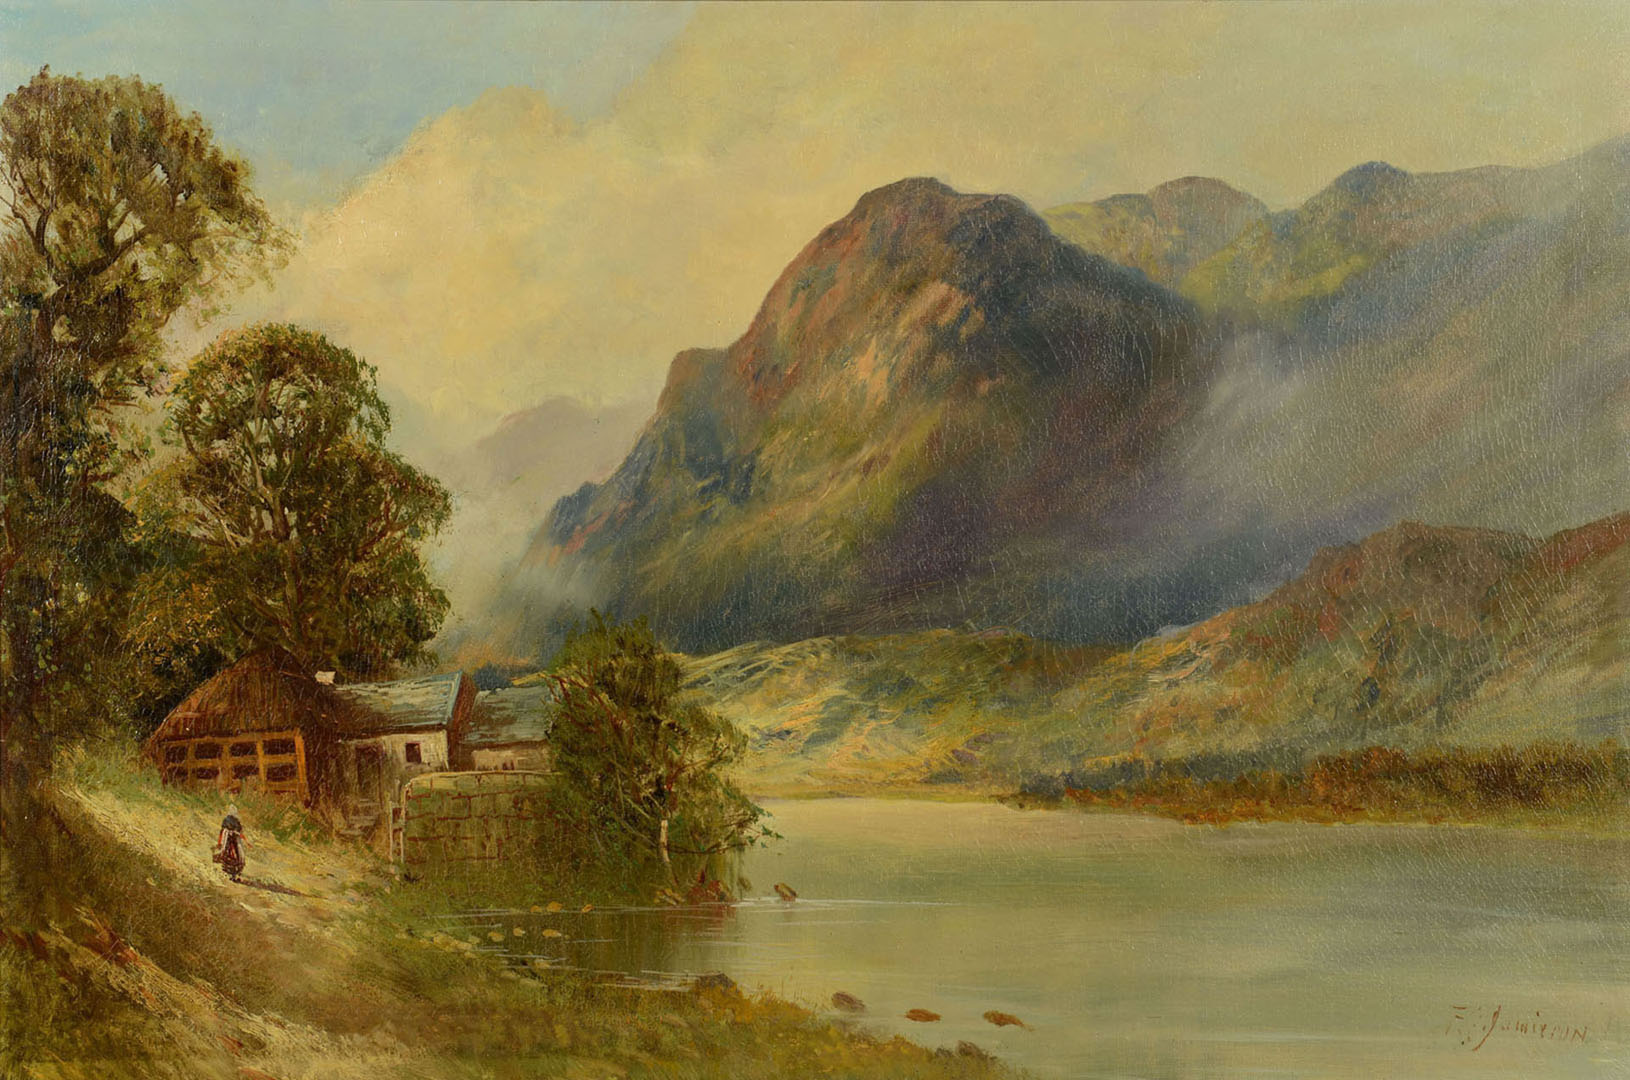 Lot 2872262: F.E. Jamieson o/c, Scottish Highland Landscape